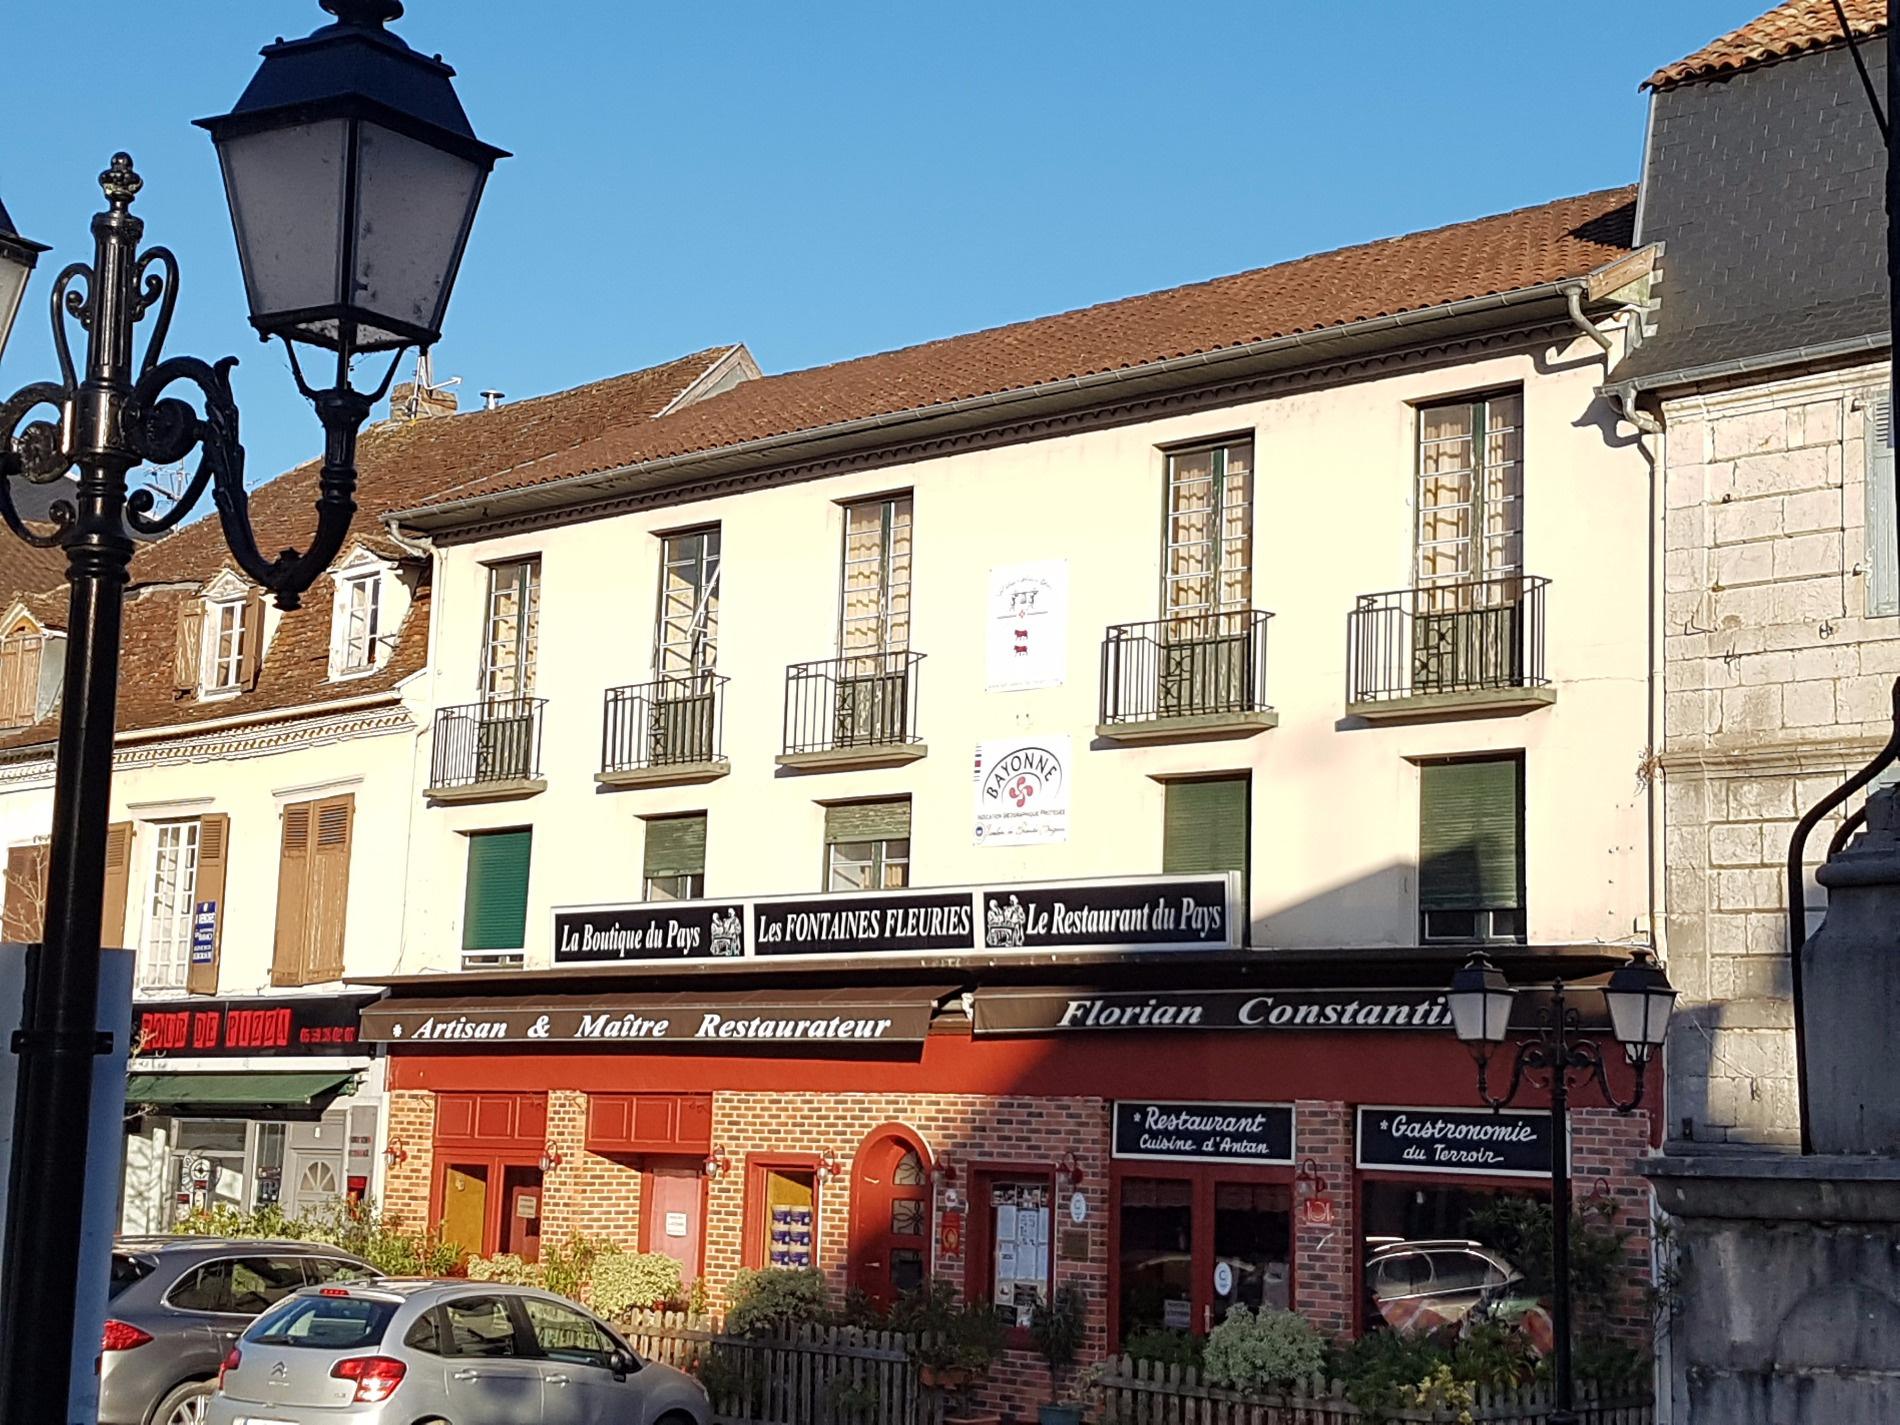 Vente Immobilier Professionnel Local commercial Salies-de-Béarn (64270)